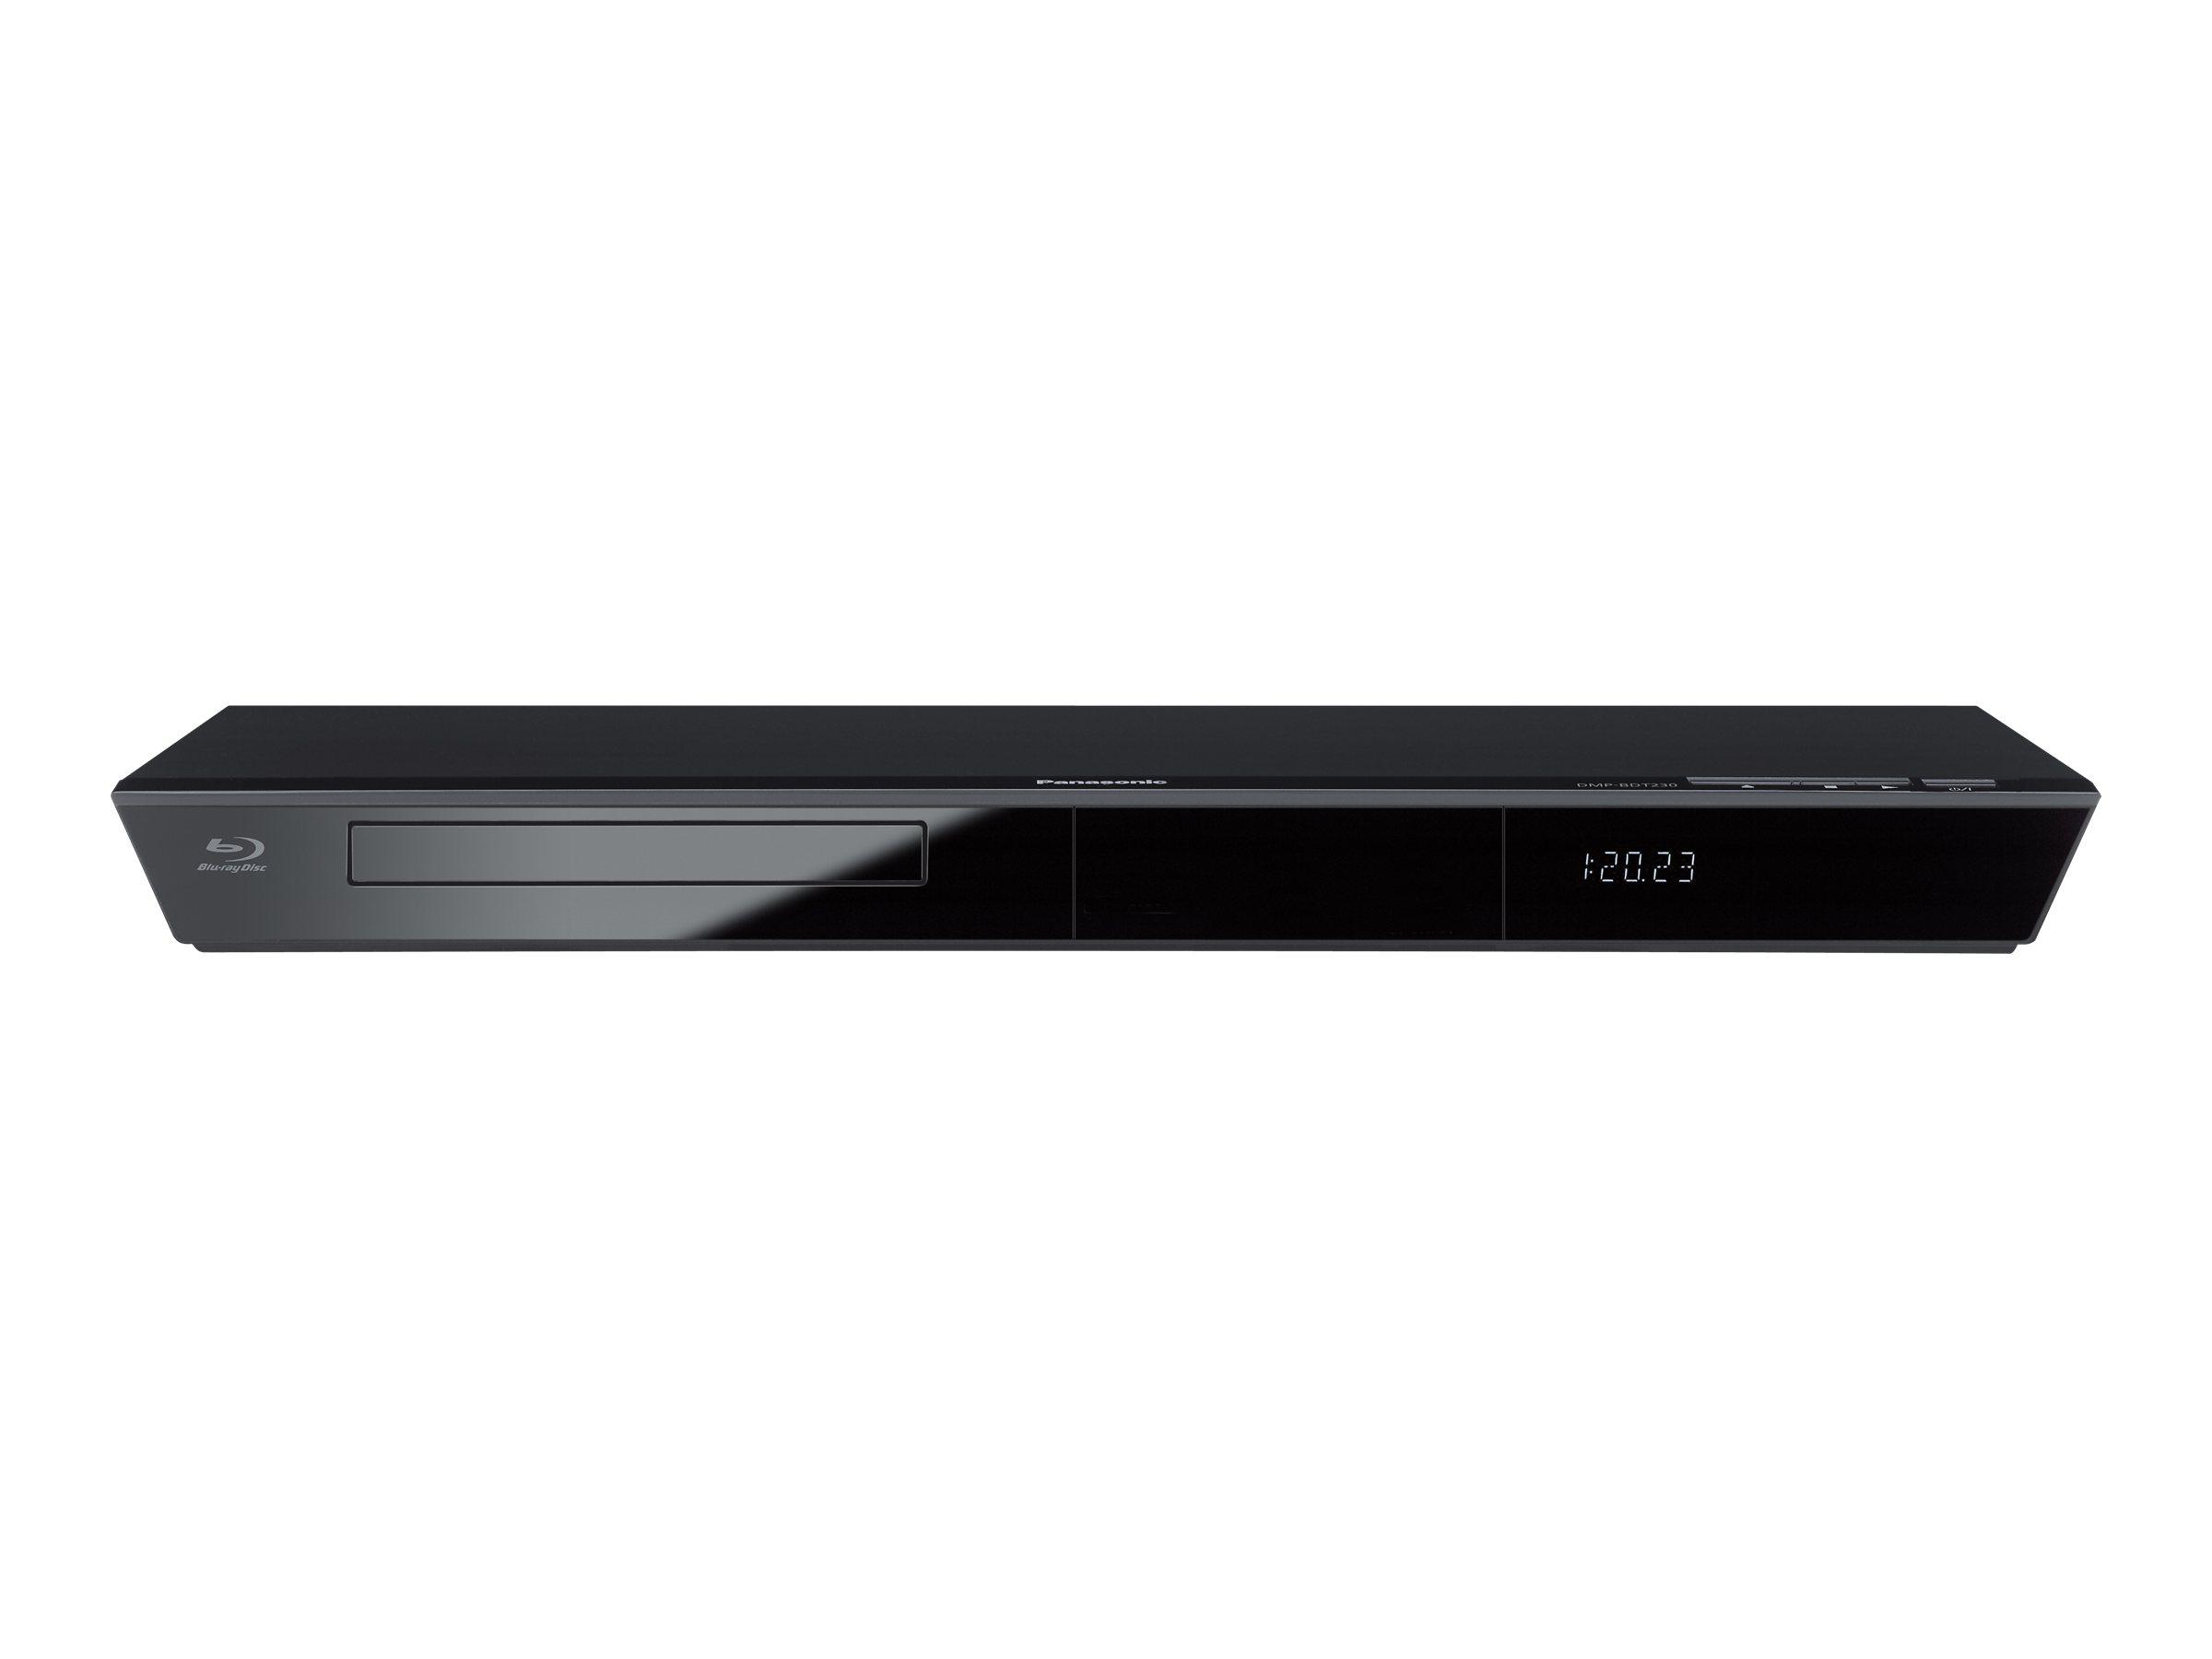 Panasonic Smart Network 3D Blu-ray Disc™ Player - DMP-BDT230